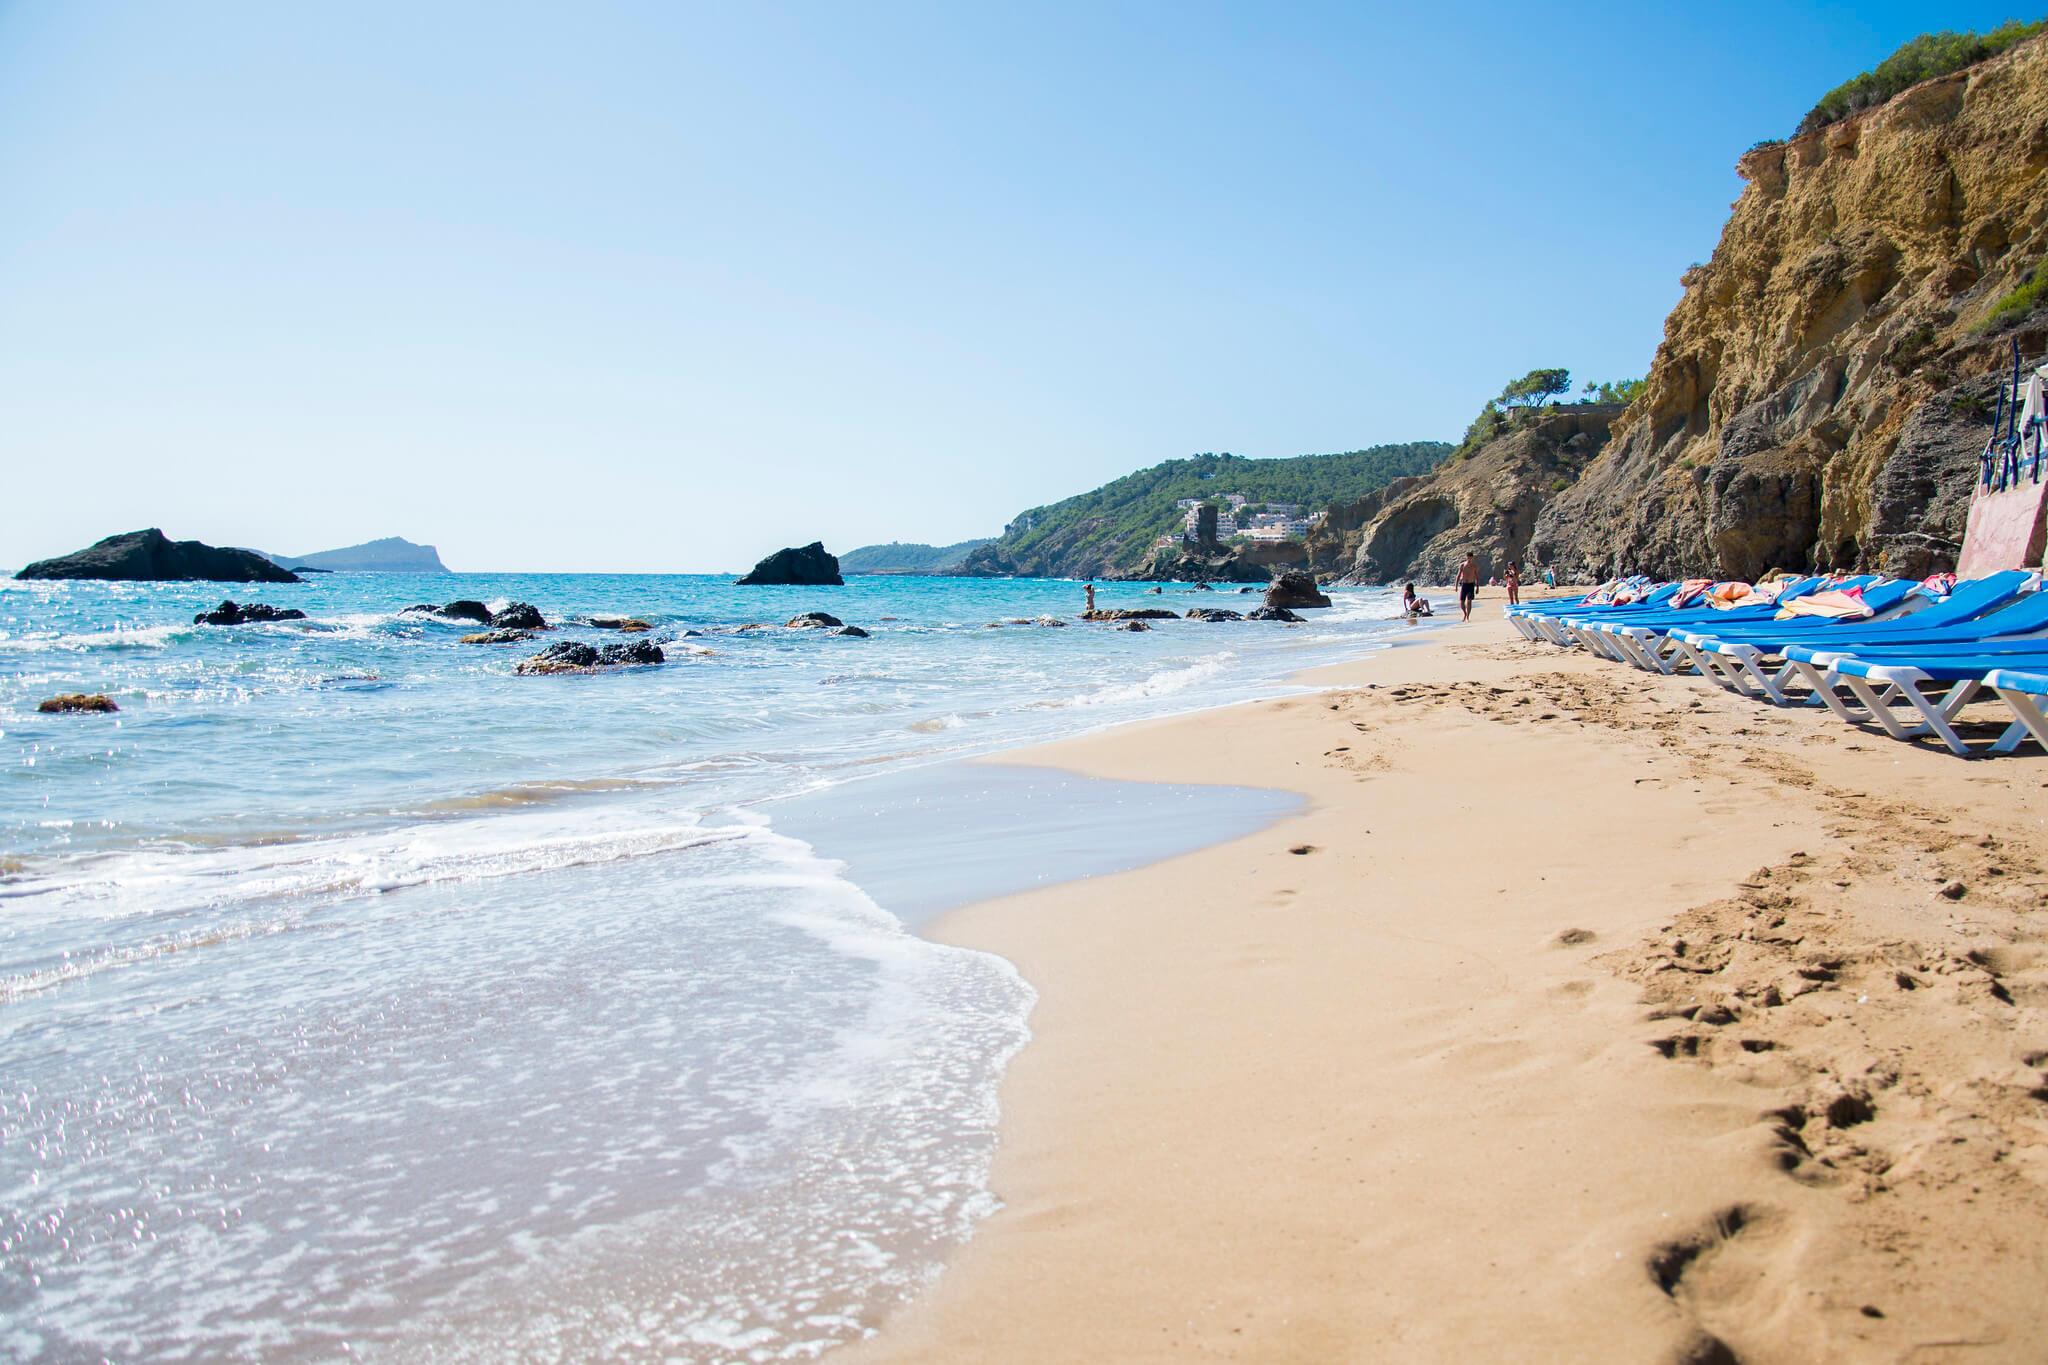 https://www.white-ibiza.com/wp-content/uploads/2020/03/ibiza-beaches-aguas-blancas-01.jpg